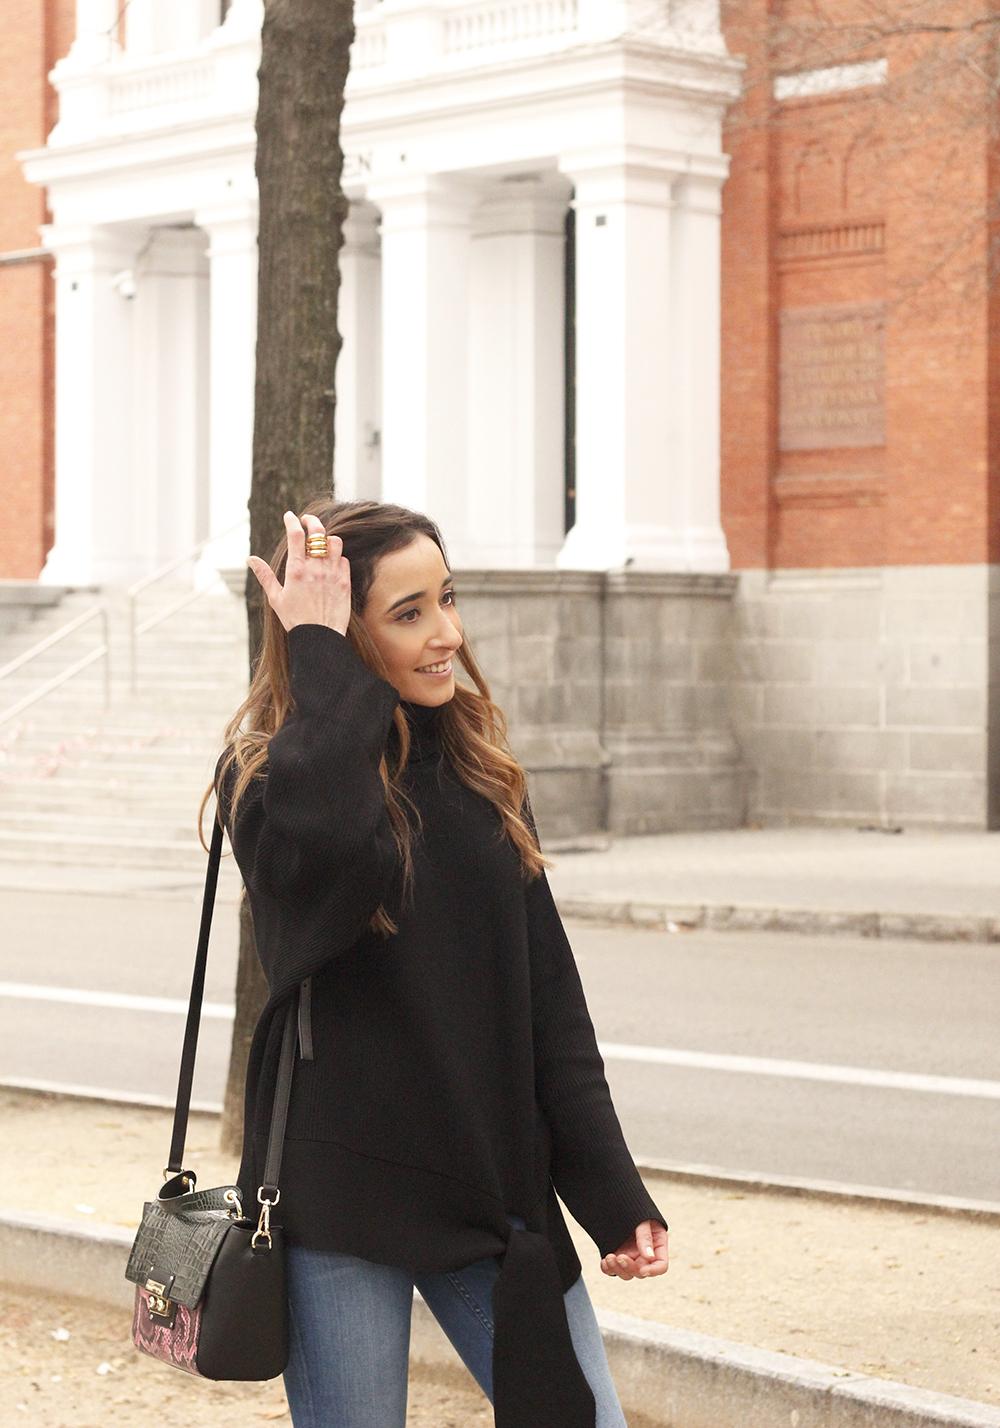 Black turtleneck sweater Uterqüe black ankle boots winter oufit 201804